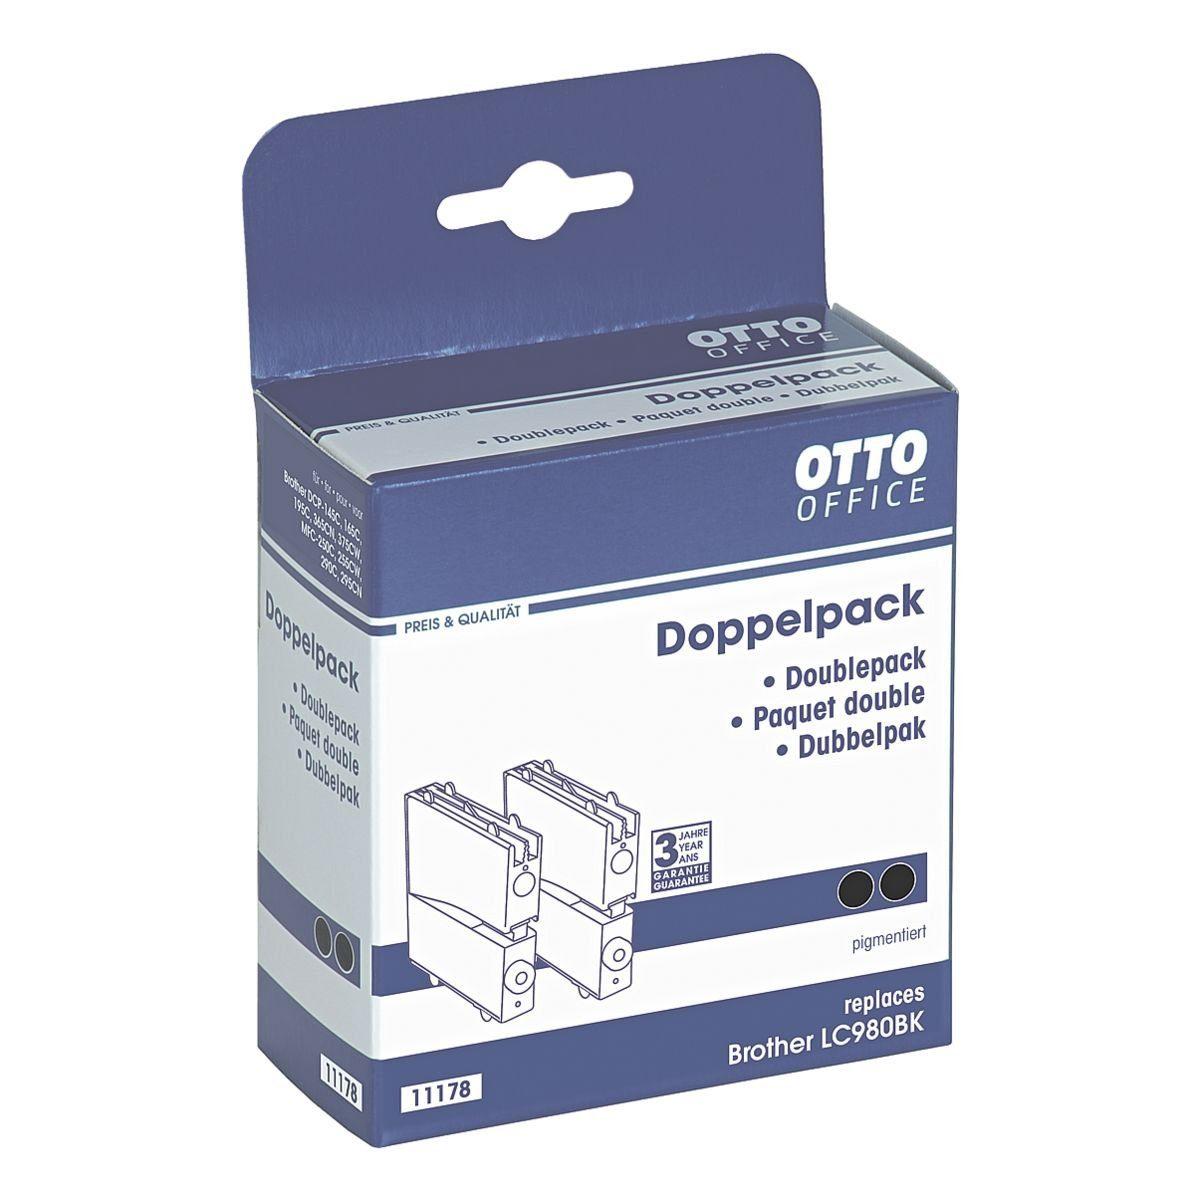 OTTO Office Standard Doppelpack Tintenpatrone ersetzt Brother »LC980BK«